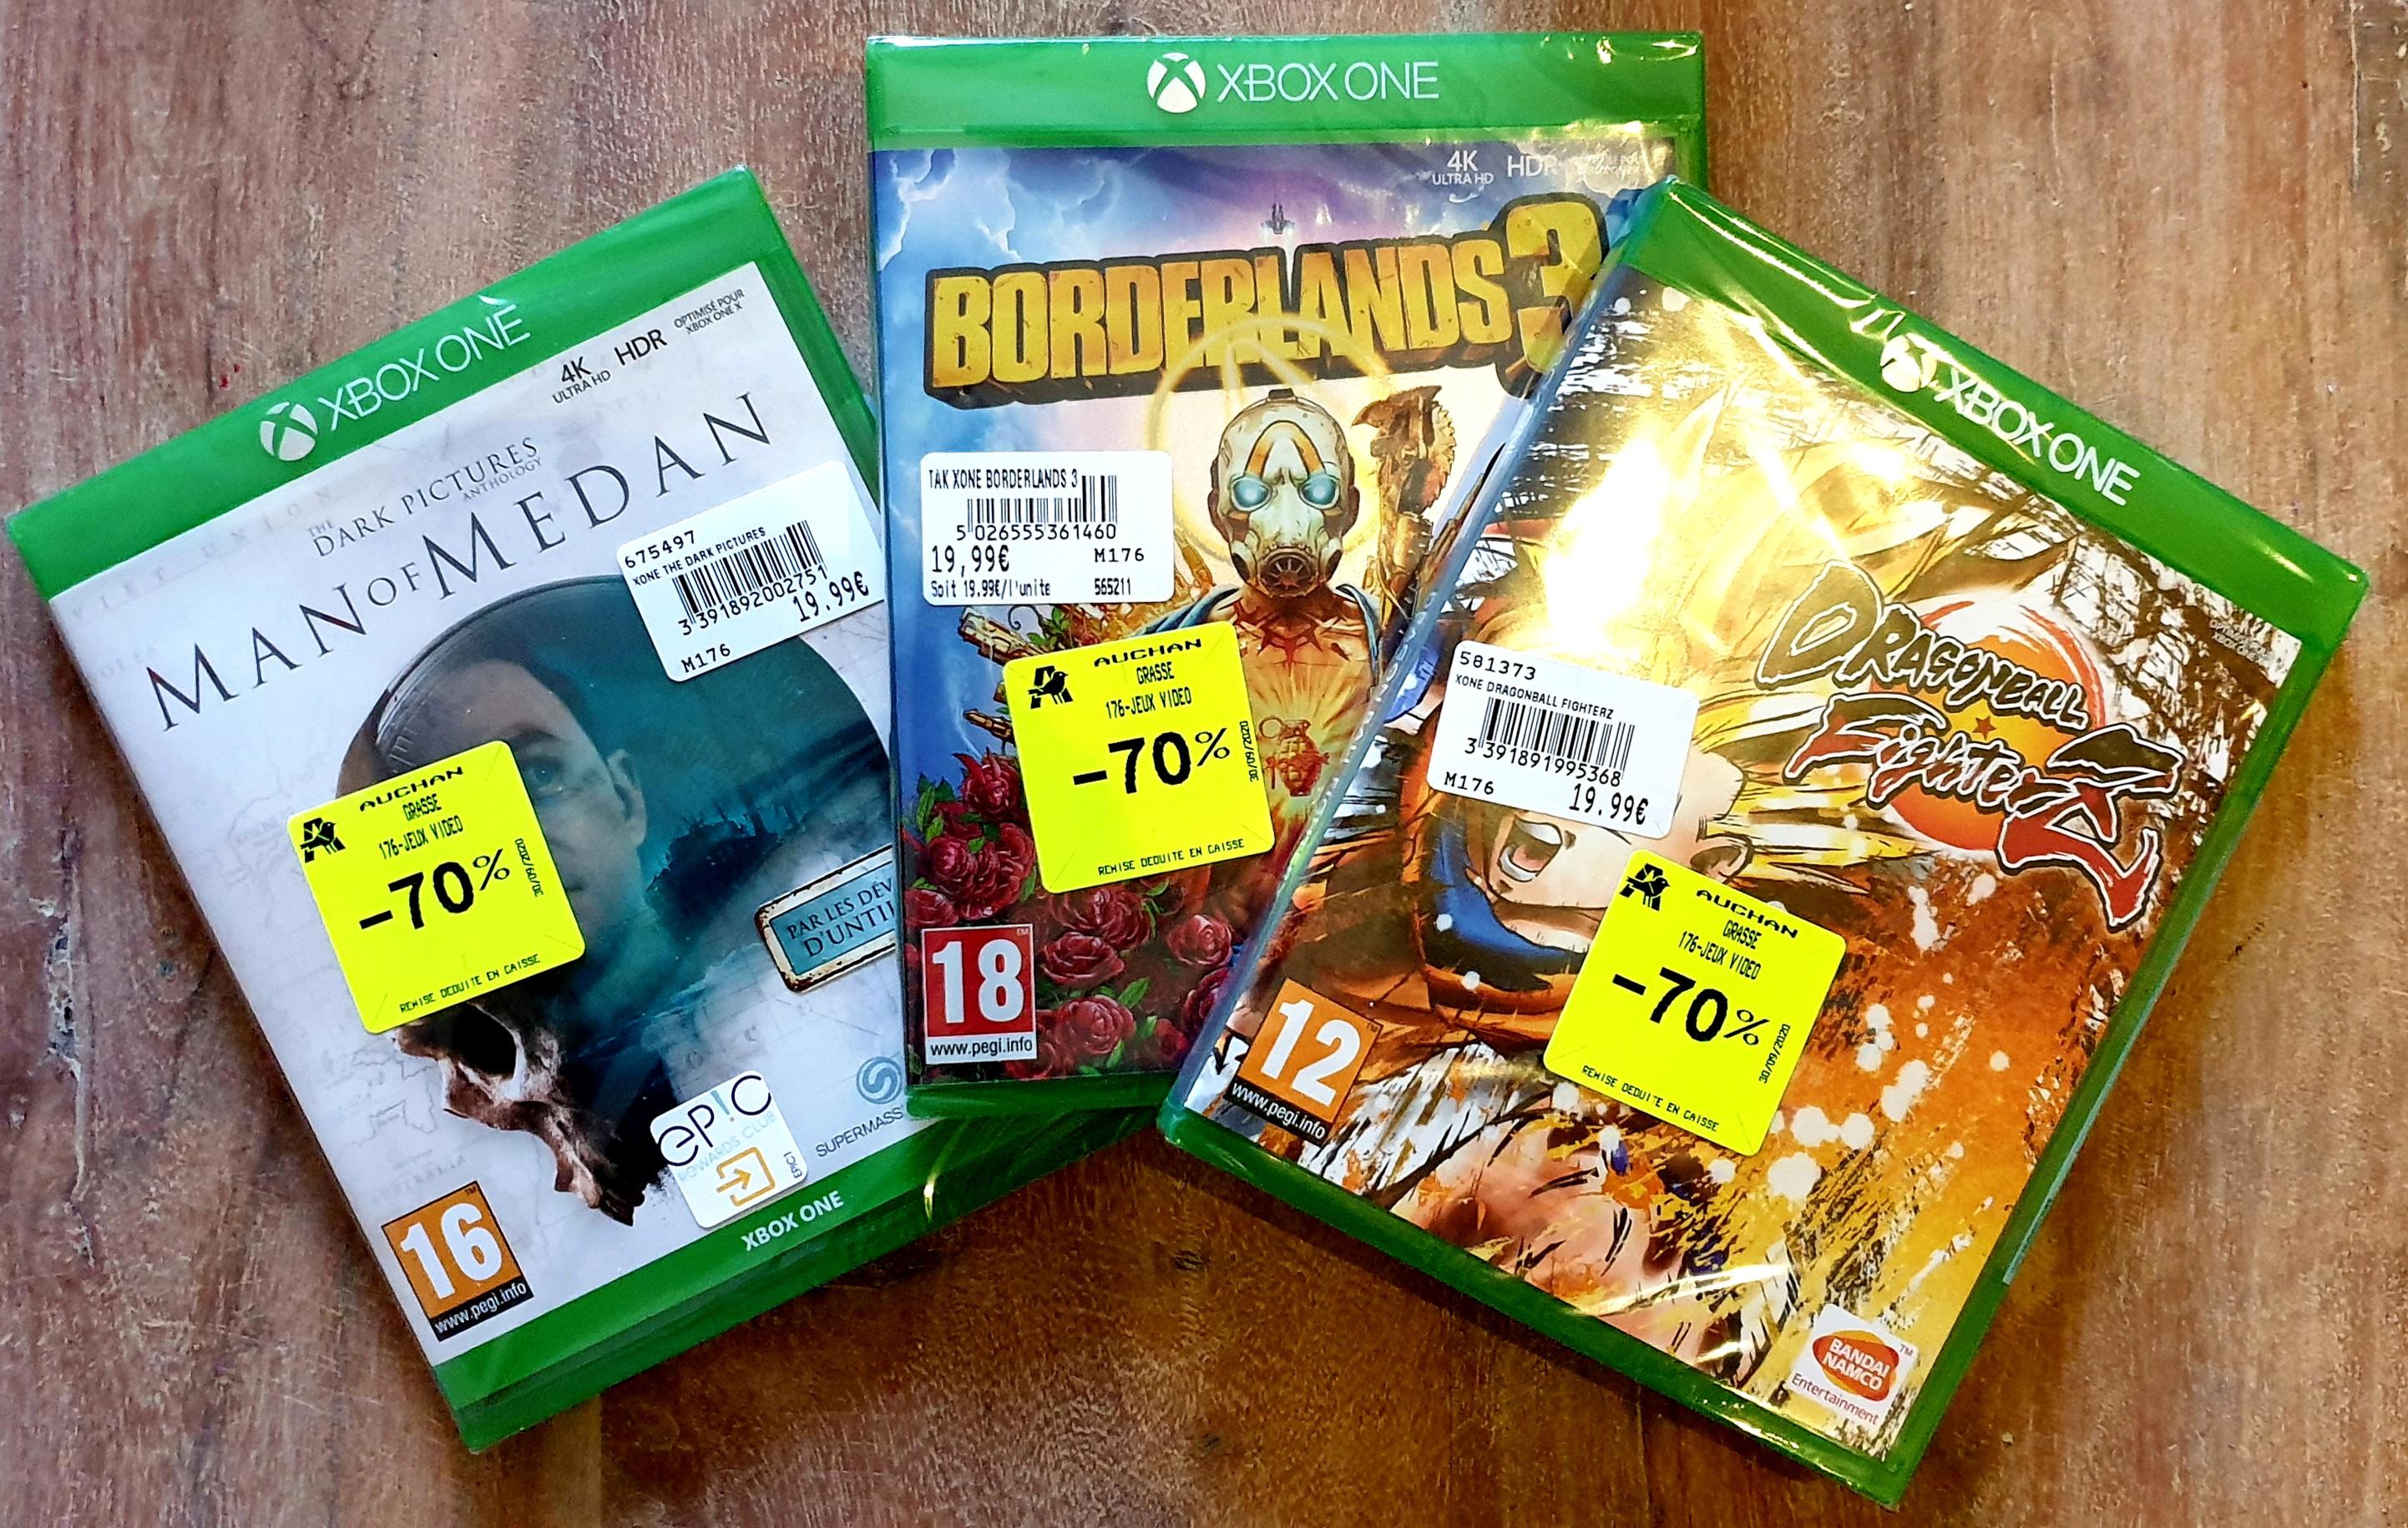 Sélection de jeux Xbox One en promotion (Ex: The Dark Pictures Anthology: Man Of Medan) - Grasse (06)